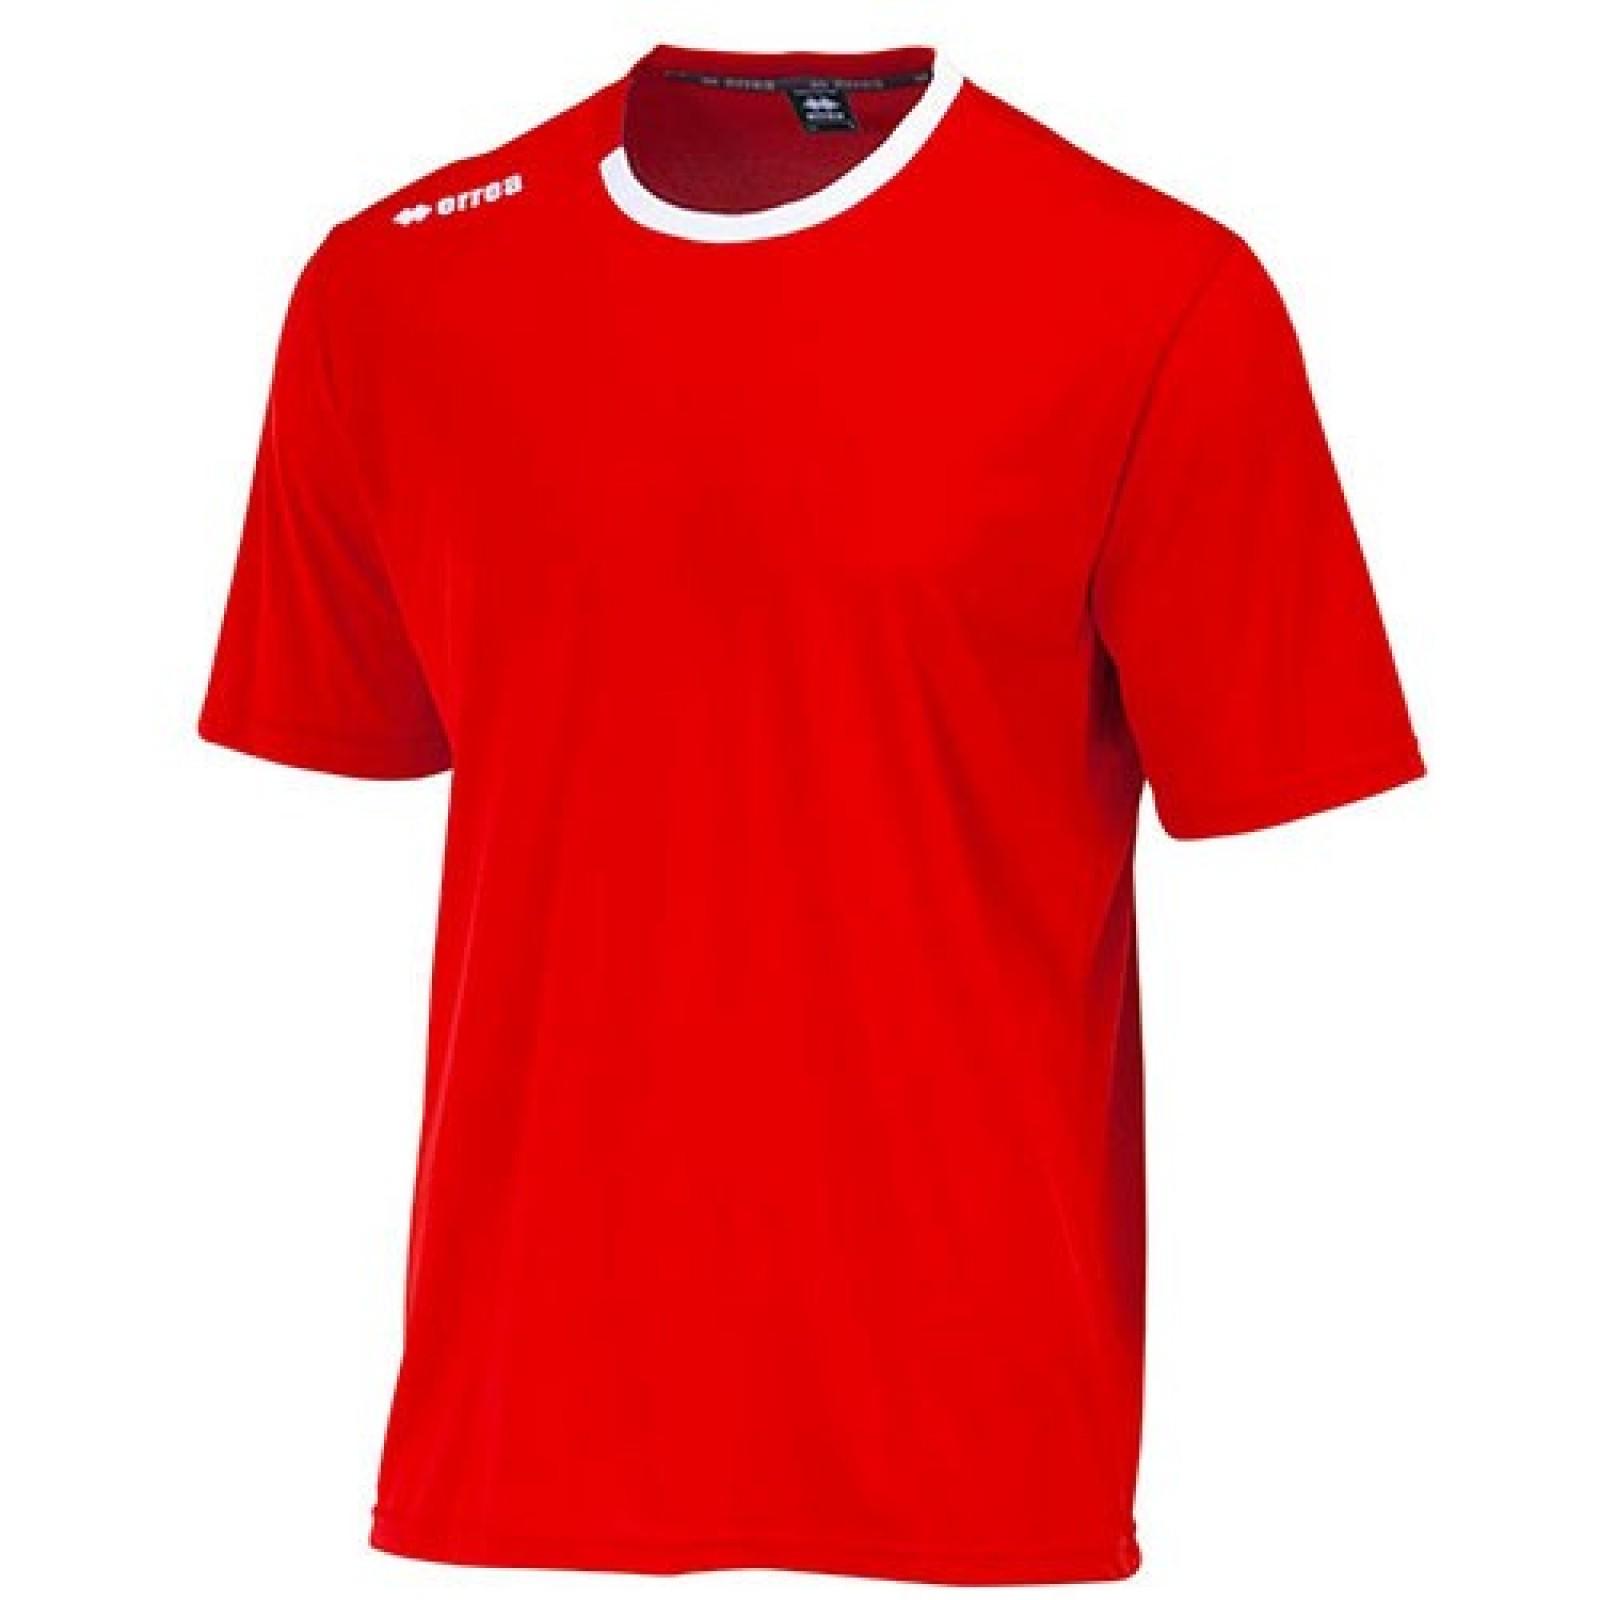 Errea Liverpool Short Sleeve Shirt